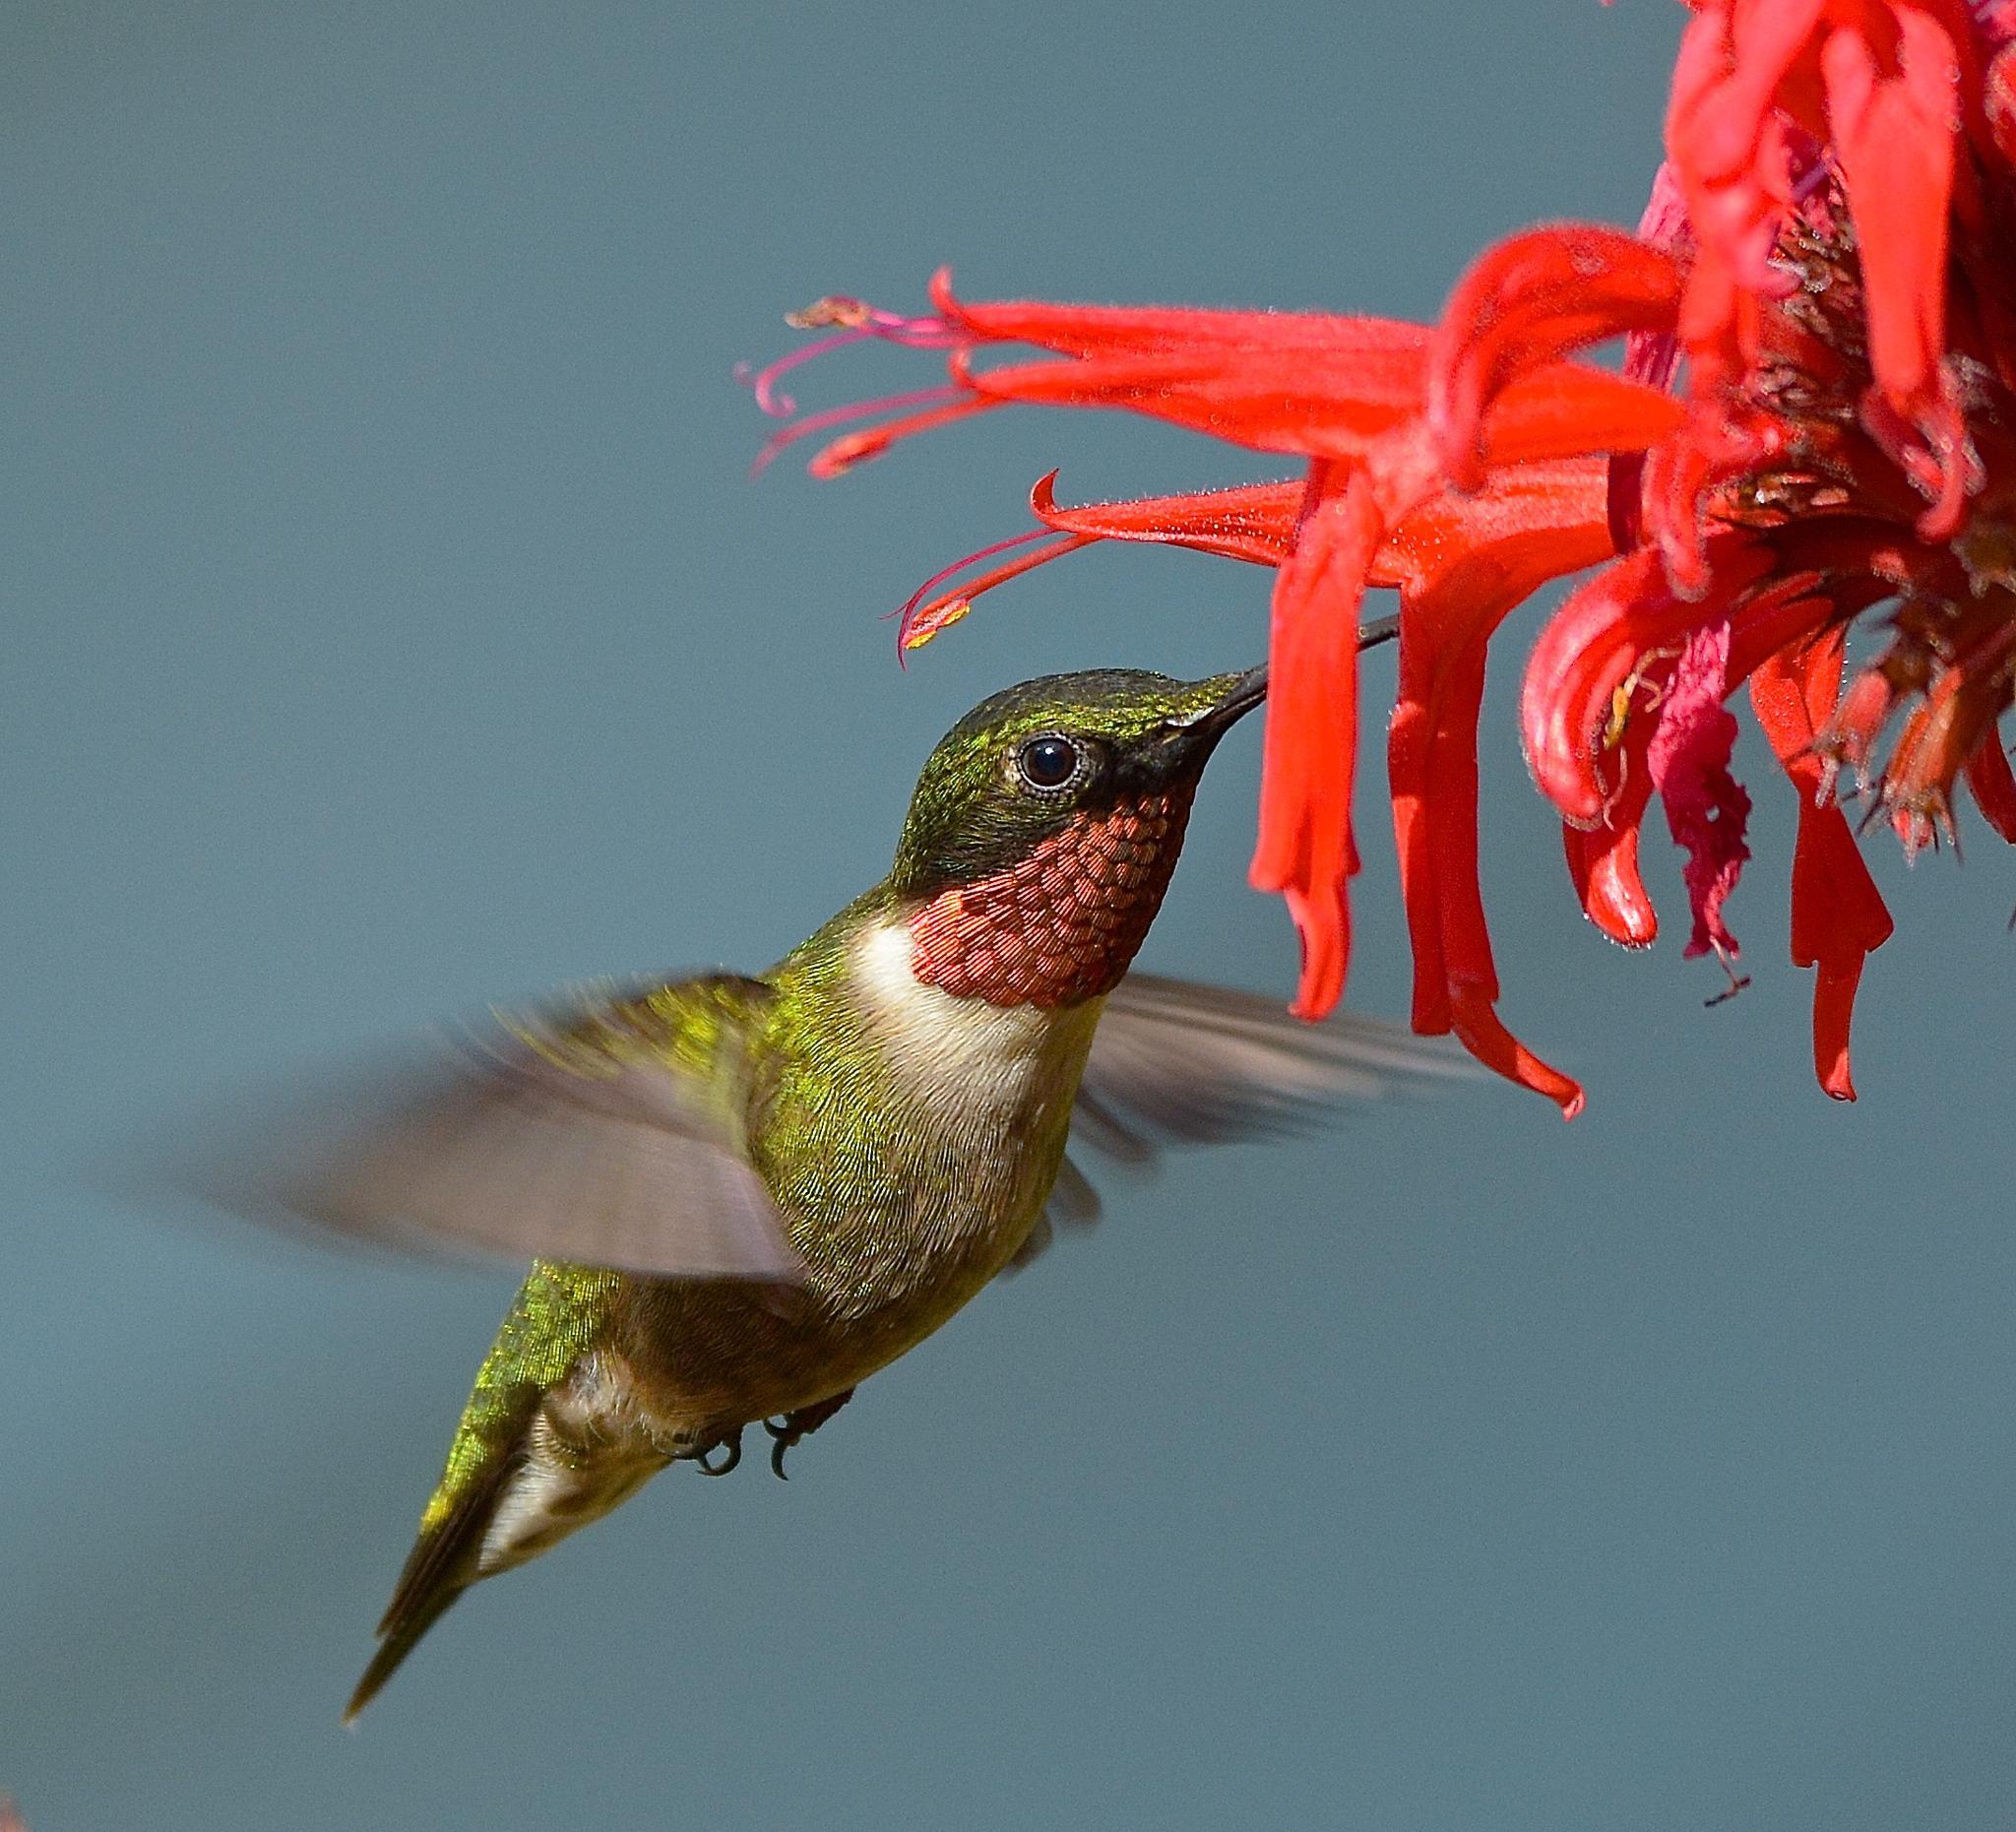 Ruby-throated hummingbird by rnc21